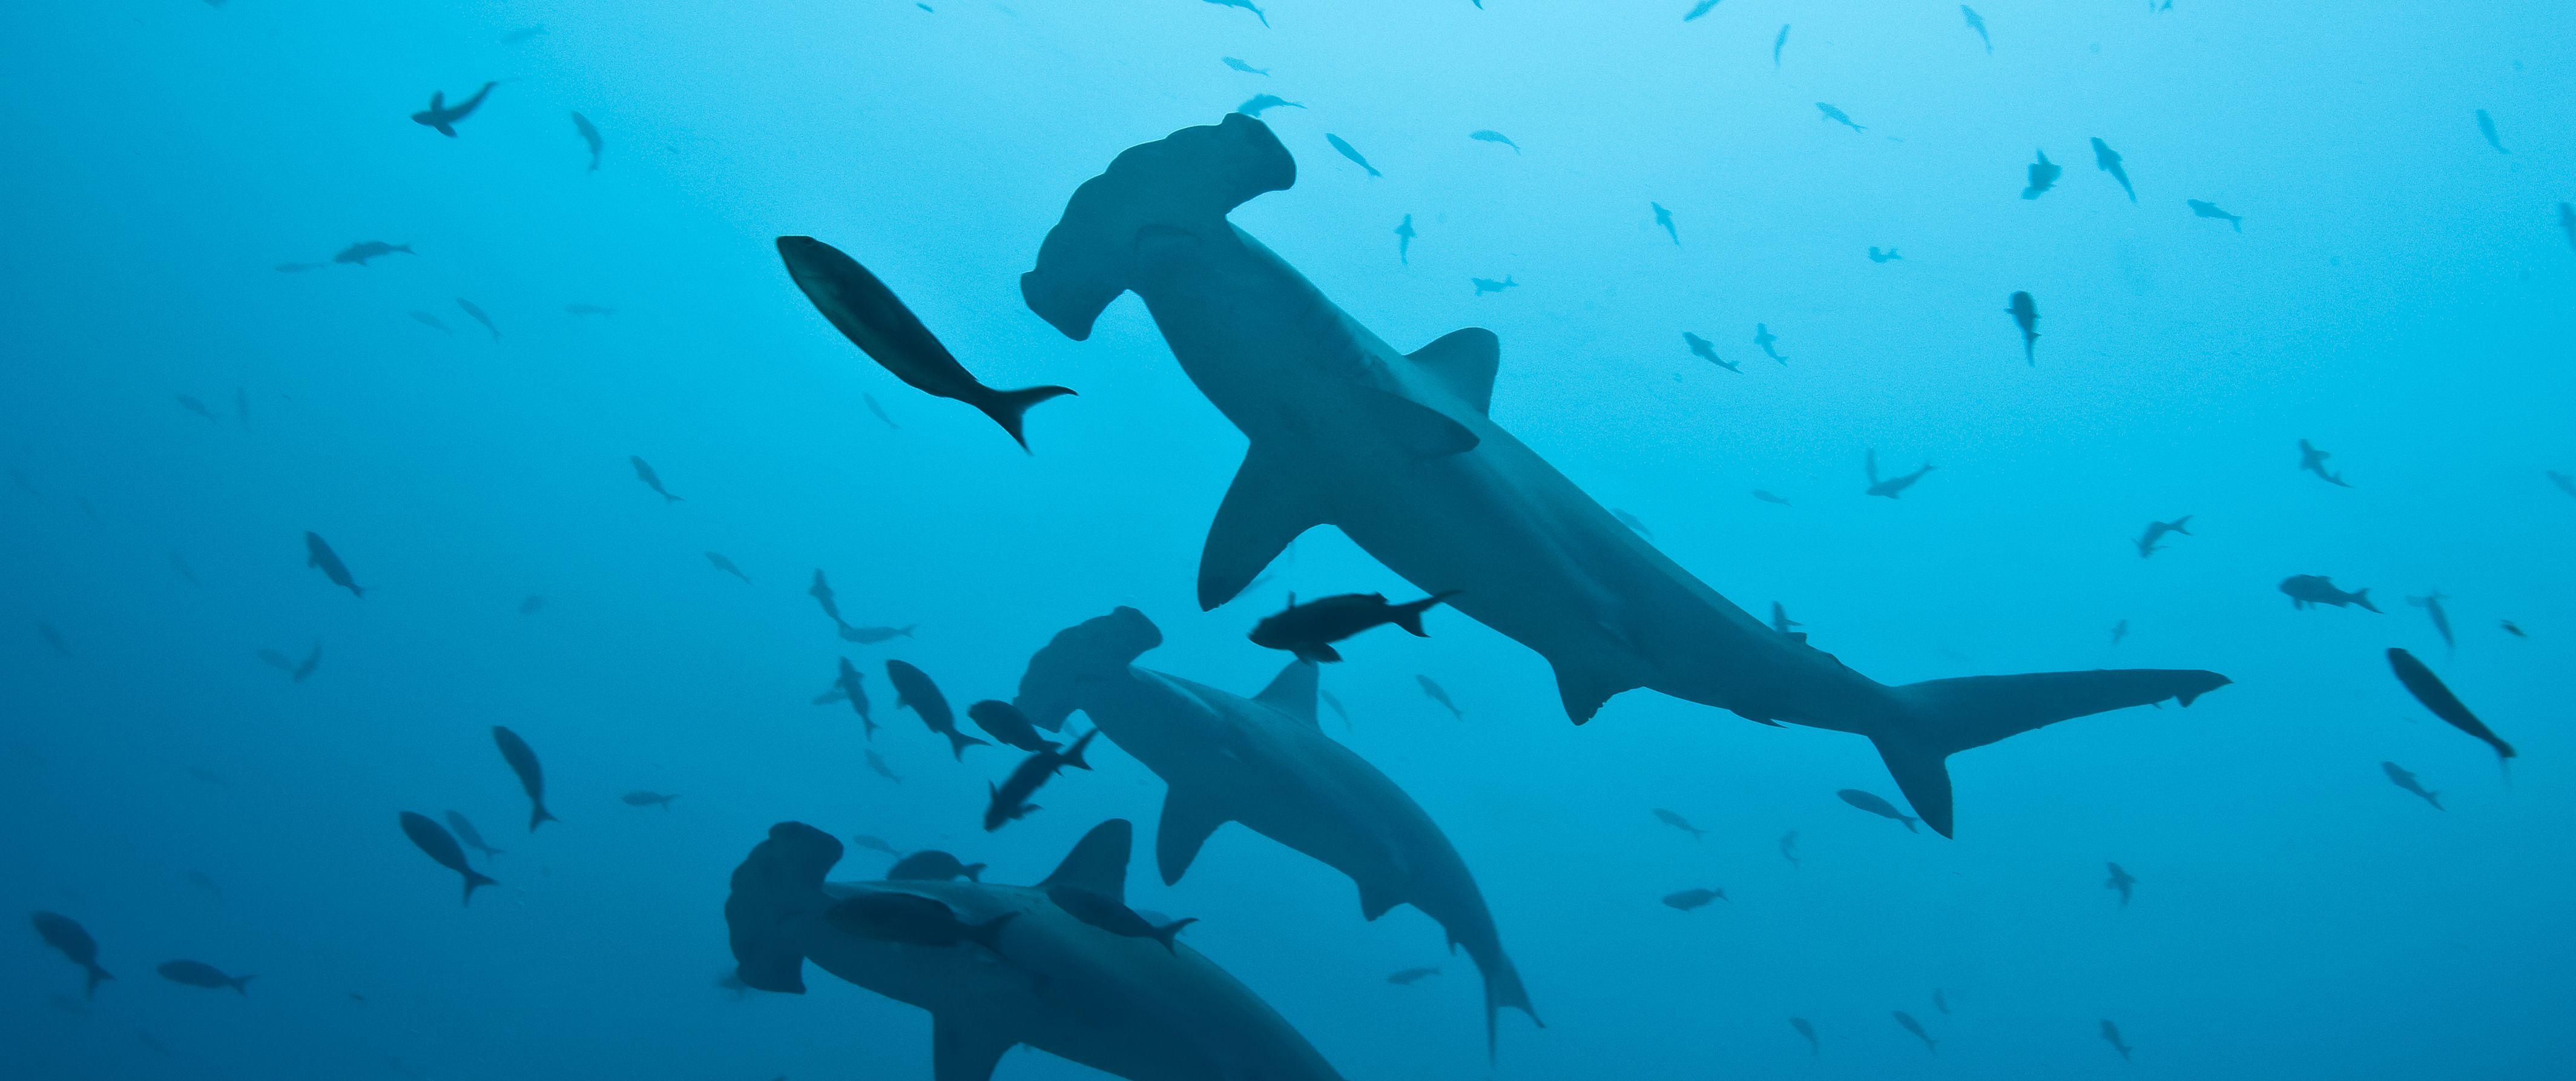 Peru Bans Landings of Shark Fins in a Bid to Protect Top Ocean Predators